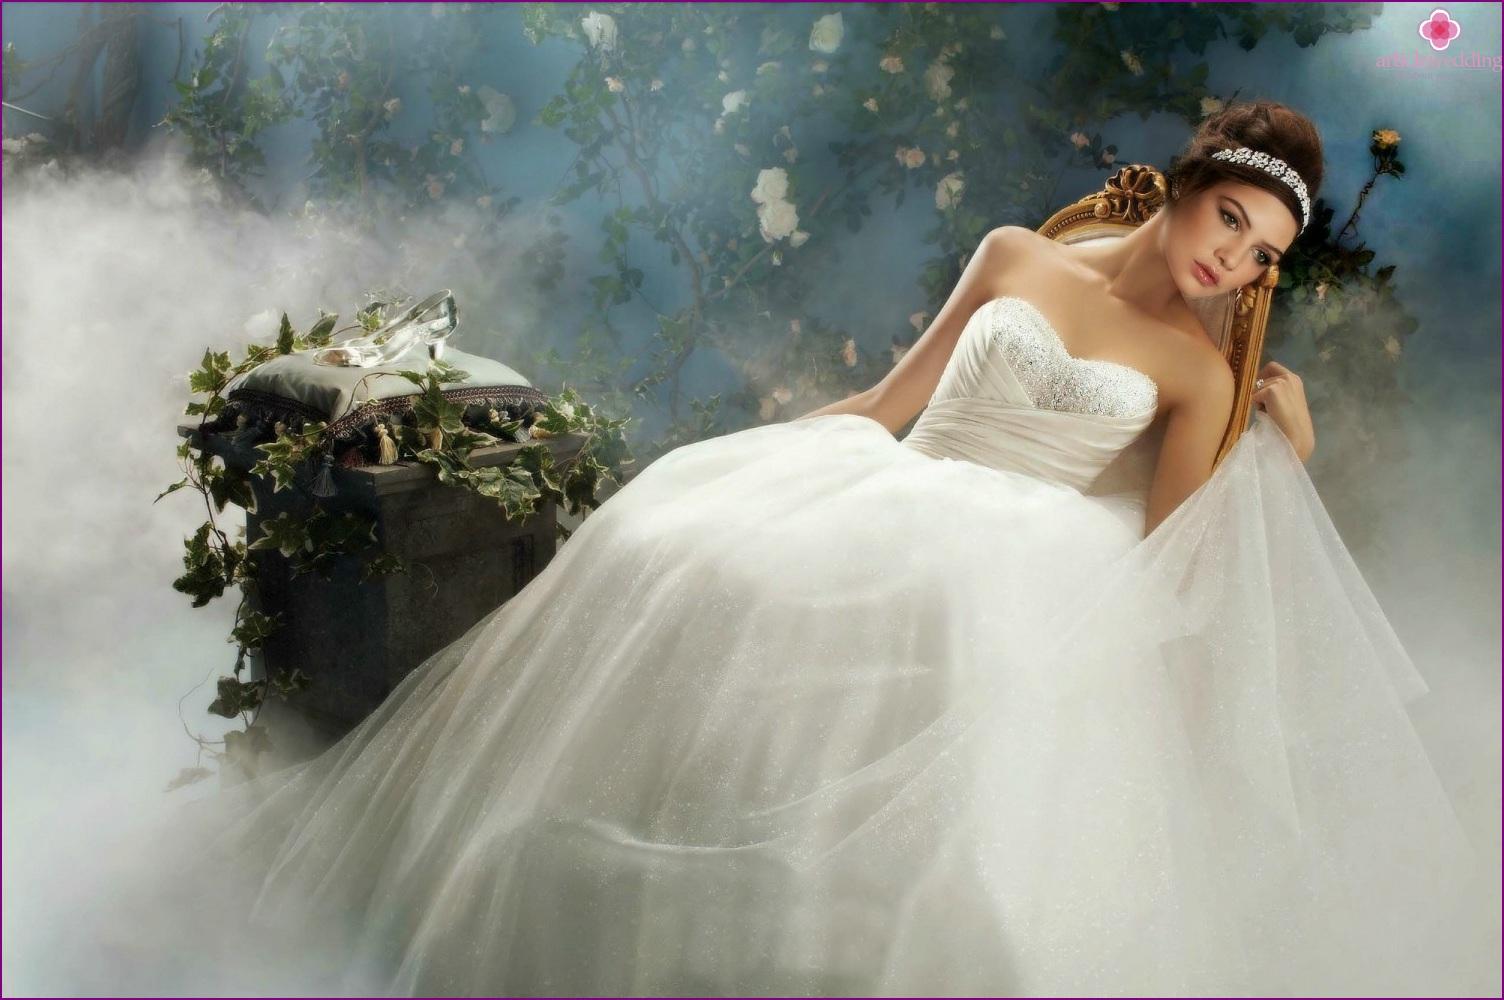 Cinderella style wedding